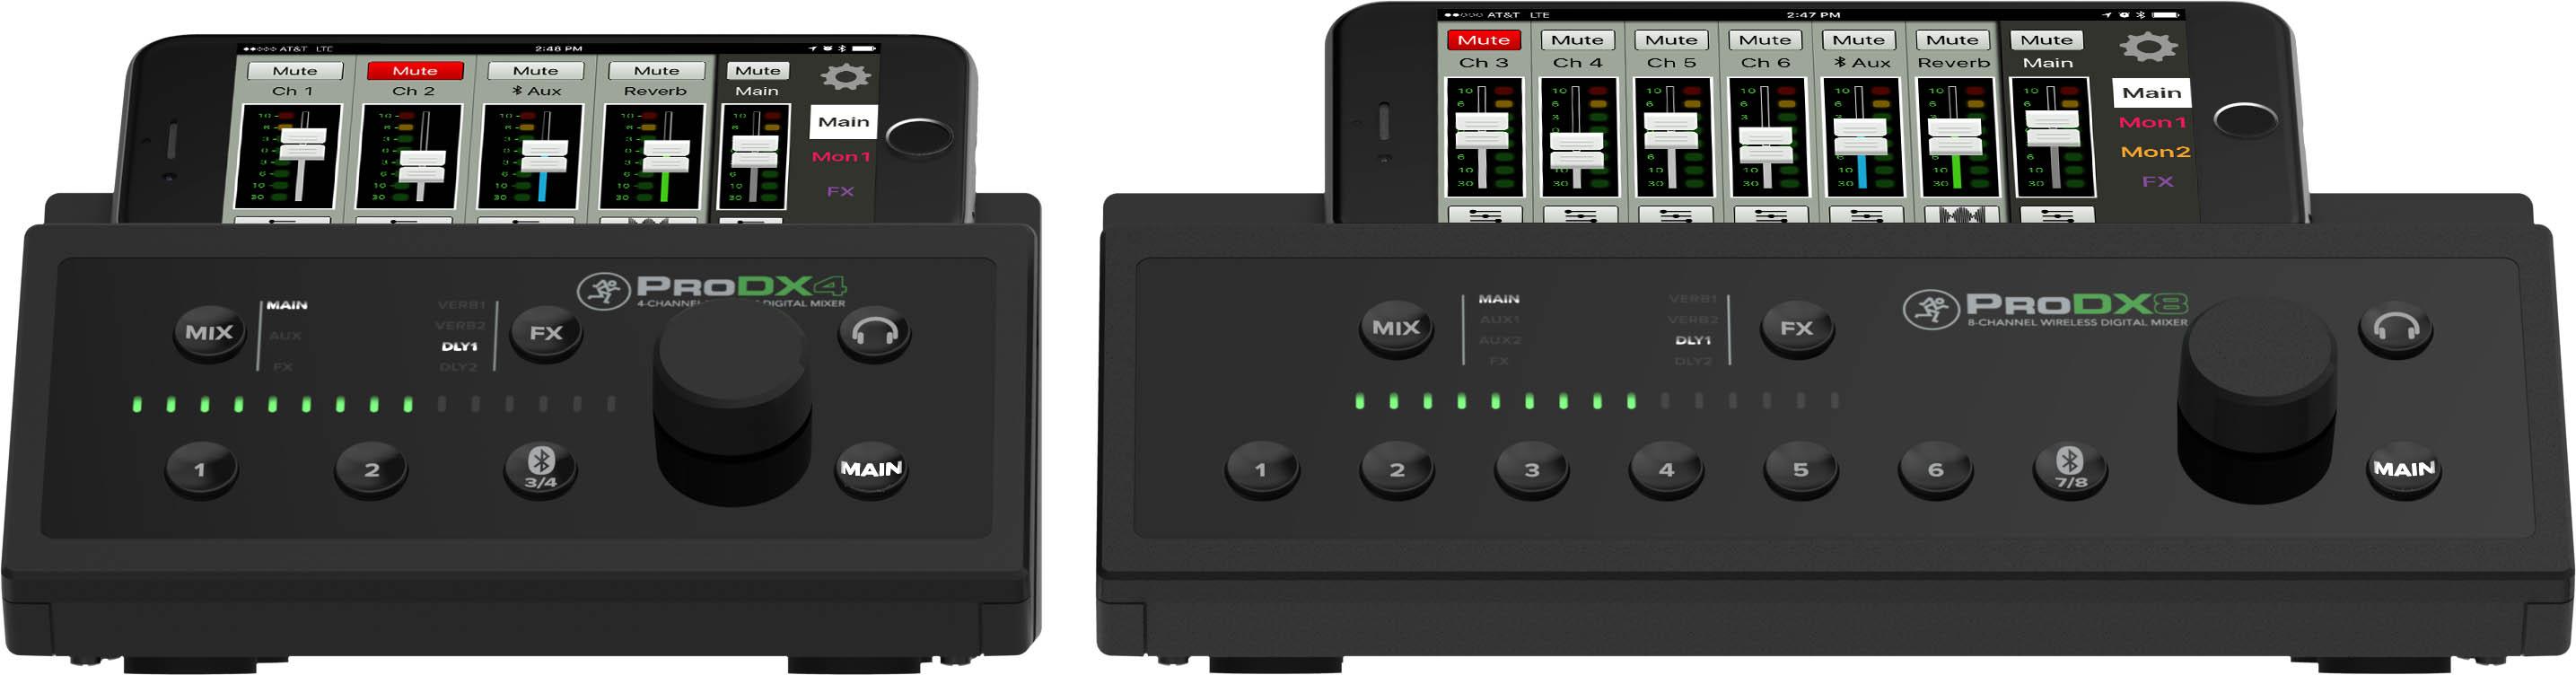 mackie introduces prodx wireless digital mixers mixonline. Black Bedroom Furniture Sets. Home Design Ideas